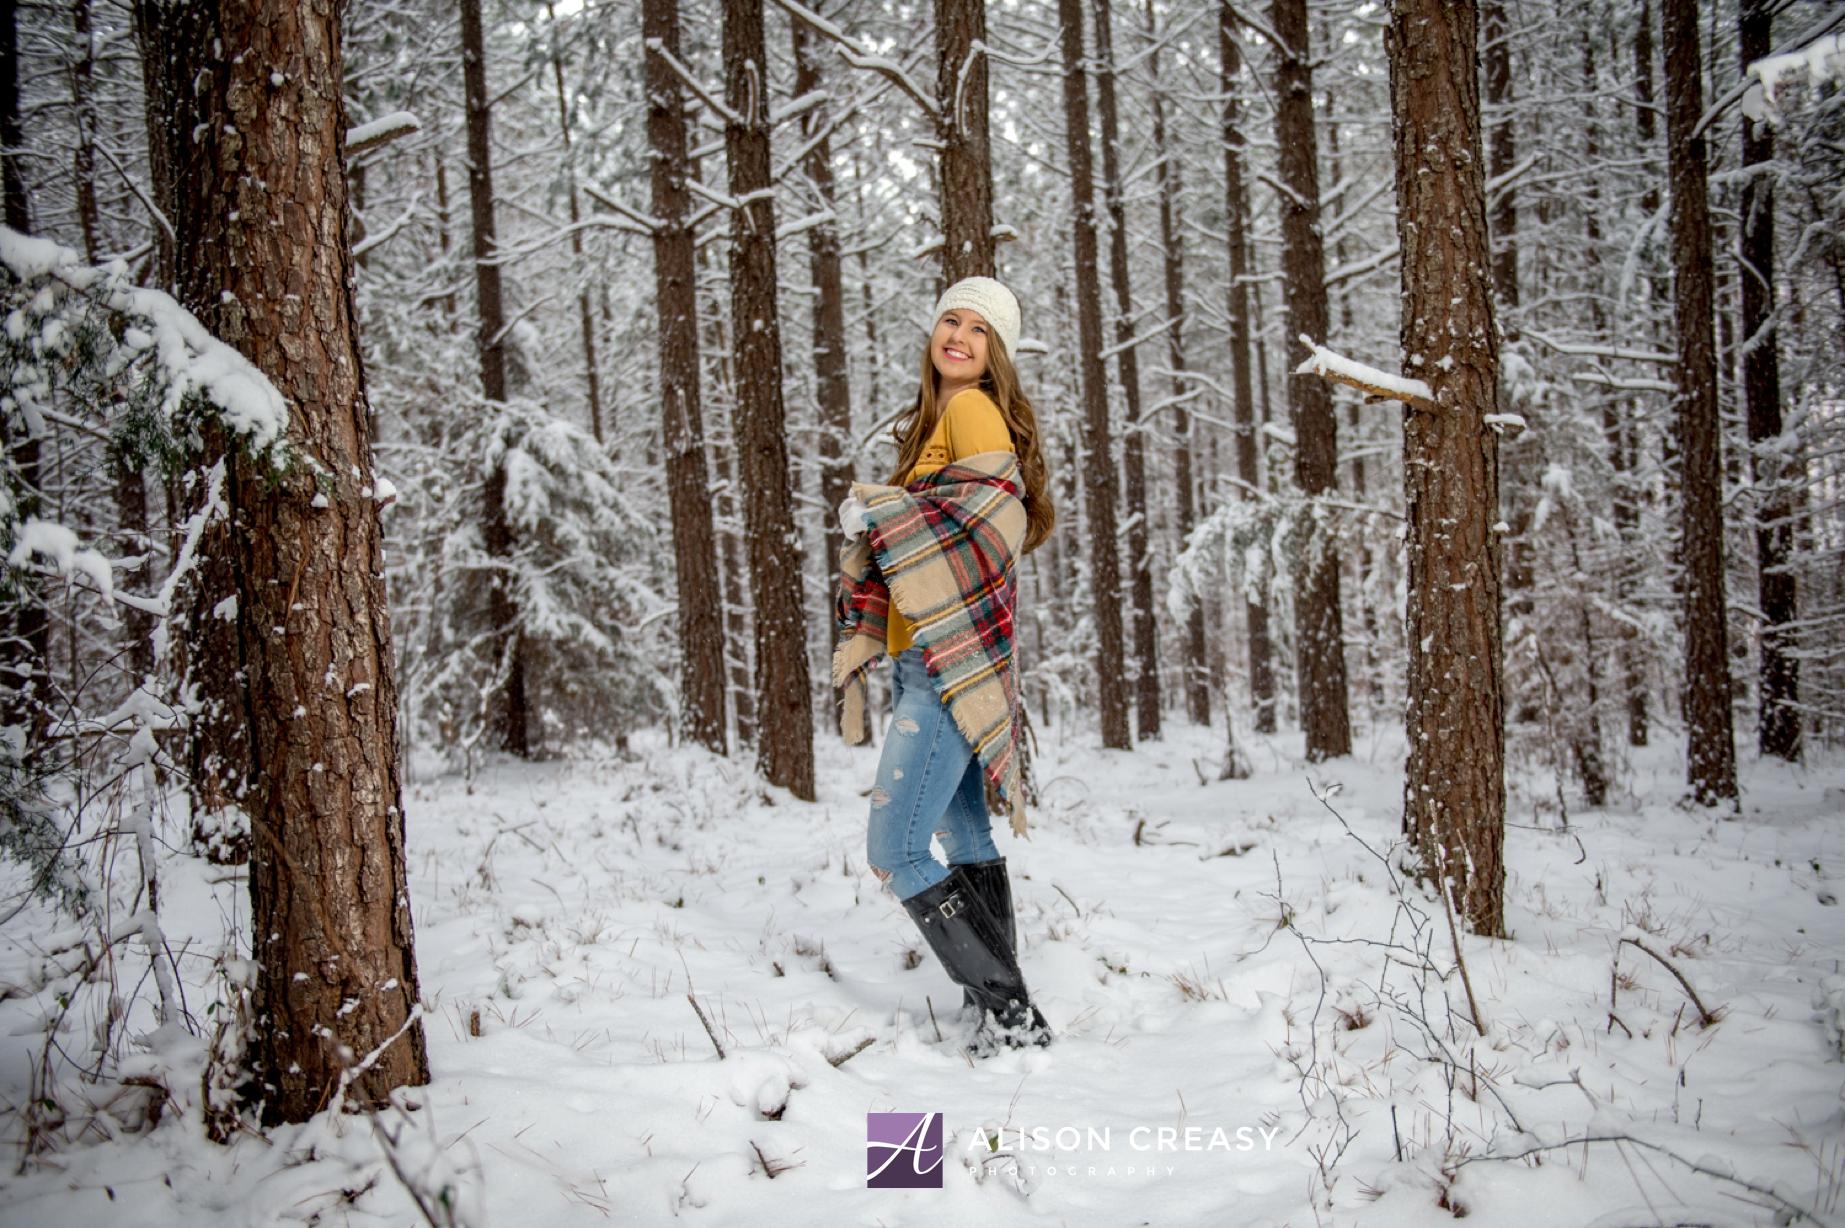 Alison-Creasy-Photography-Lynchburg-VA-Senior-Photographer_0022.jpg